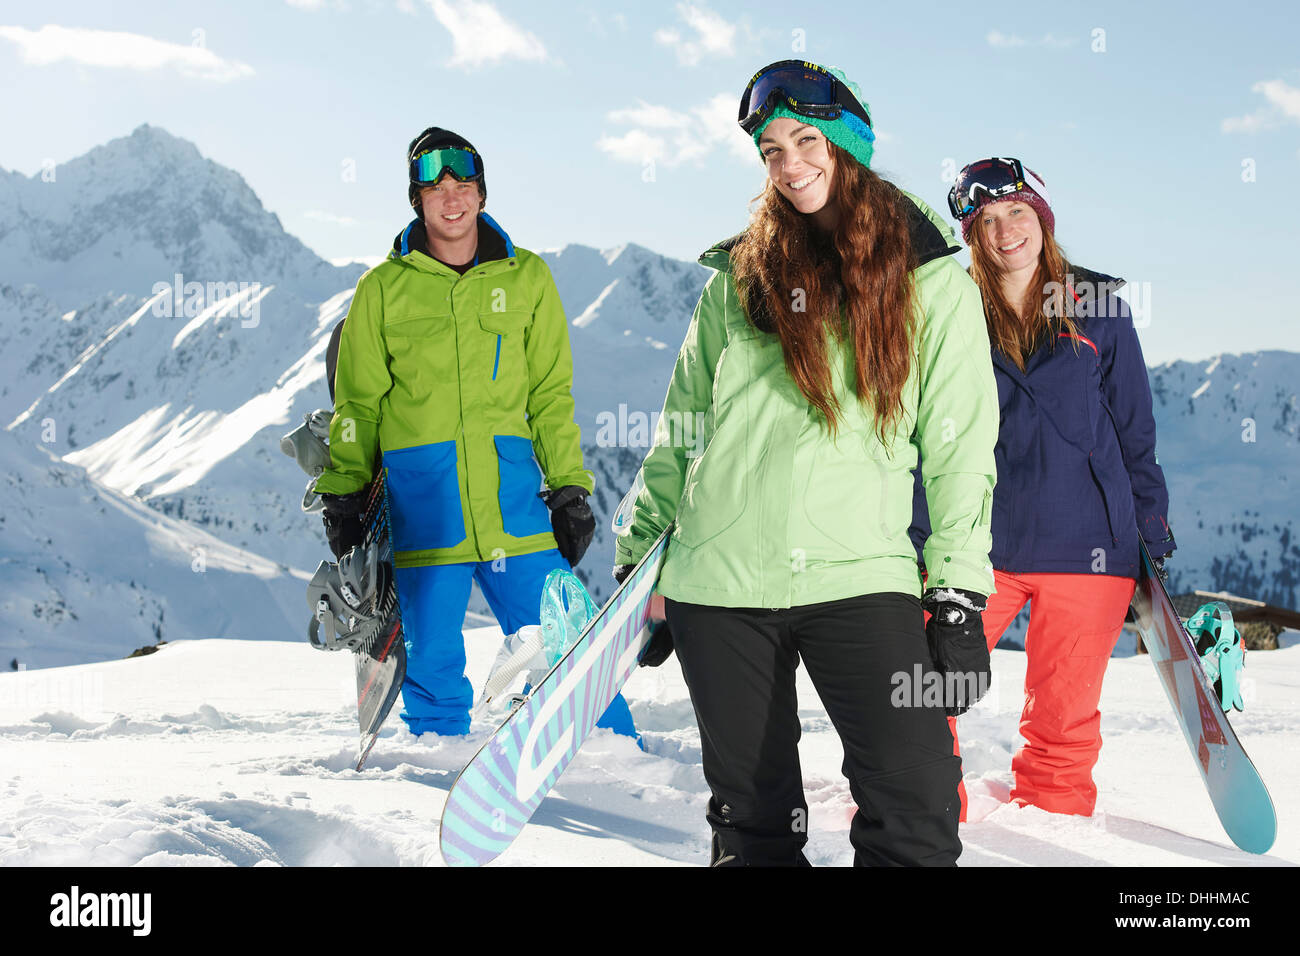 Amici holding snowboards, Kuhtai, Austria Immagini Stock